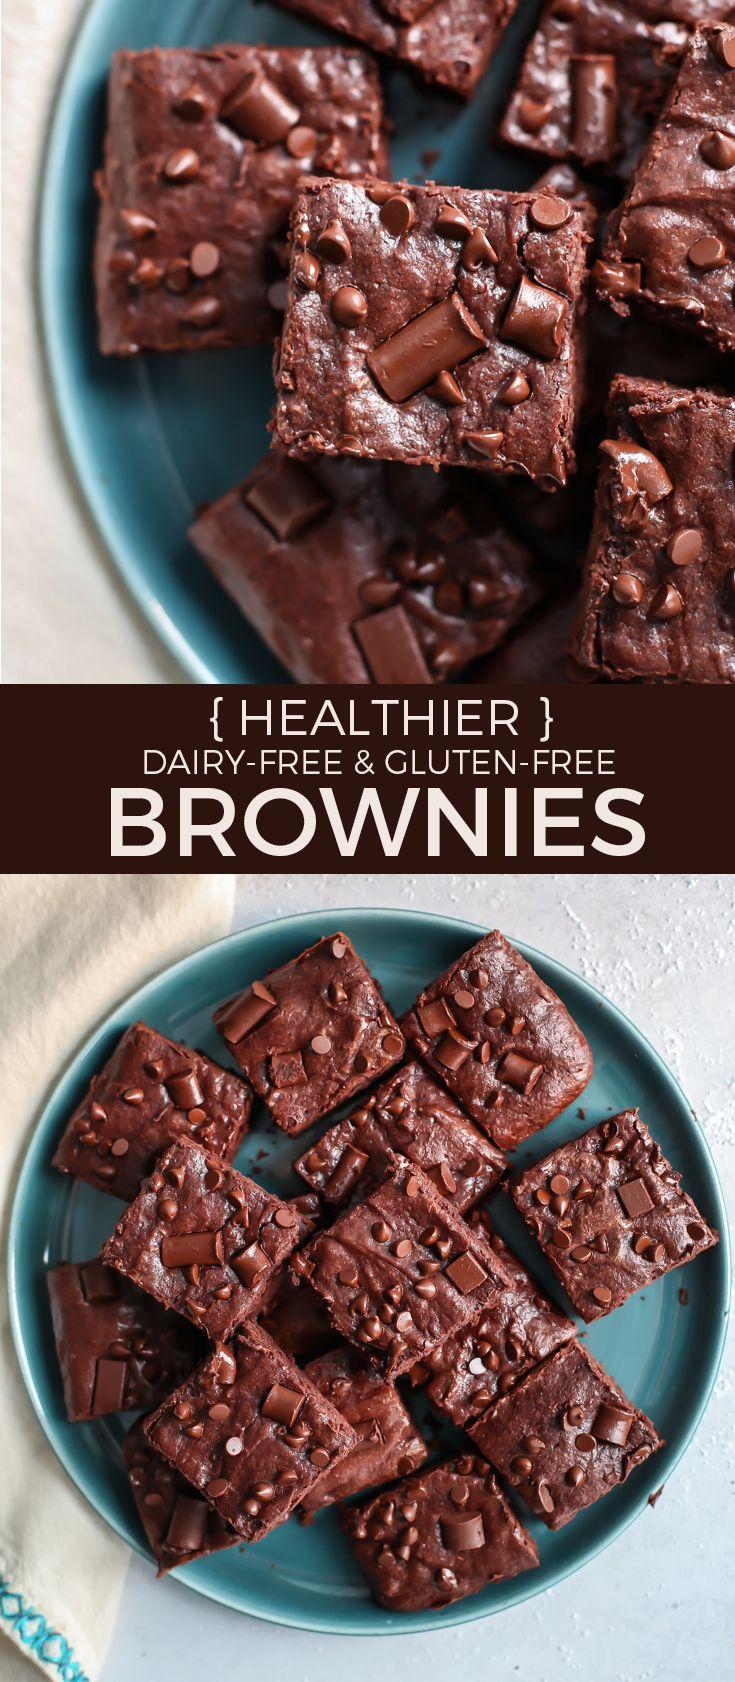 Healthier whole grain brownies glutenfree recipe